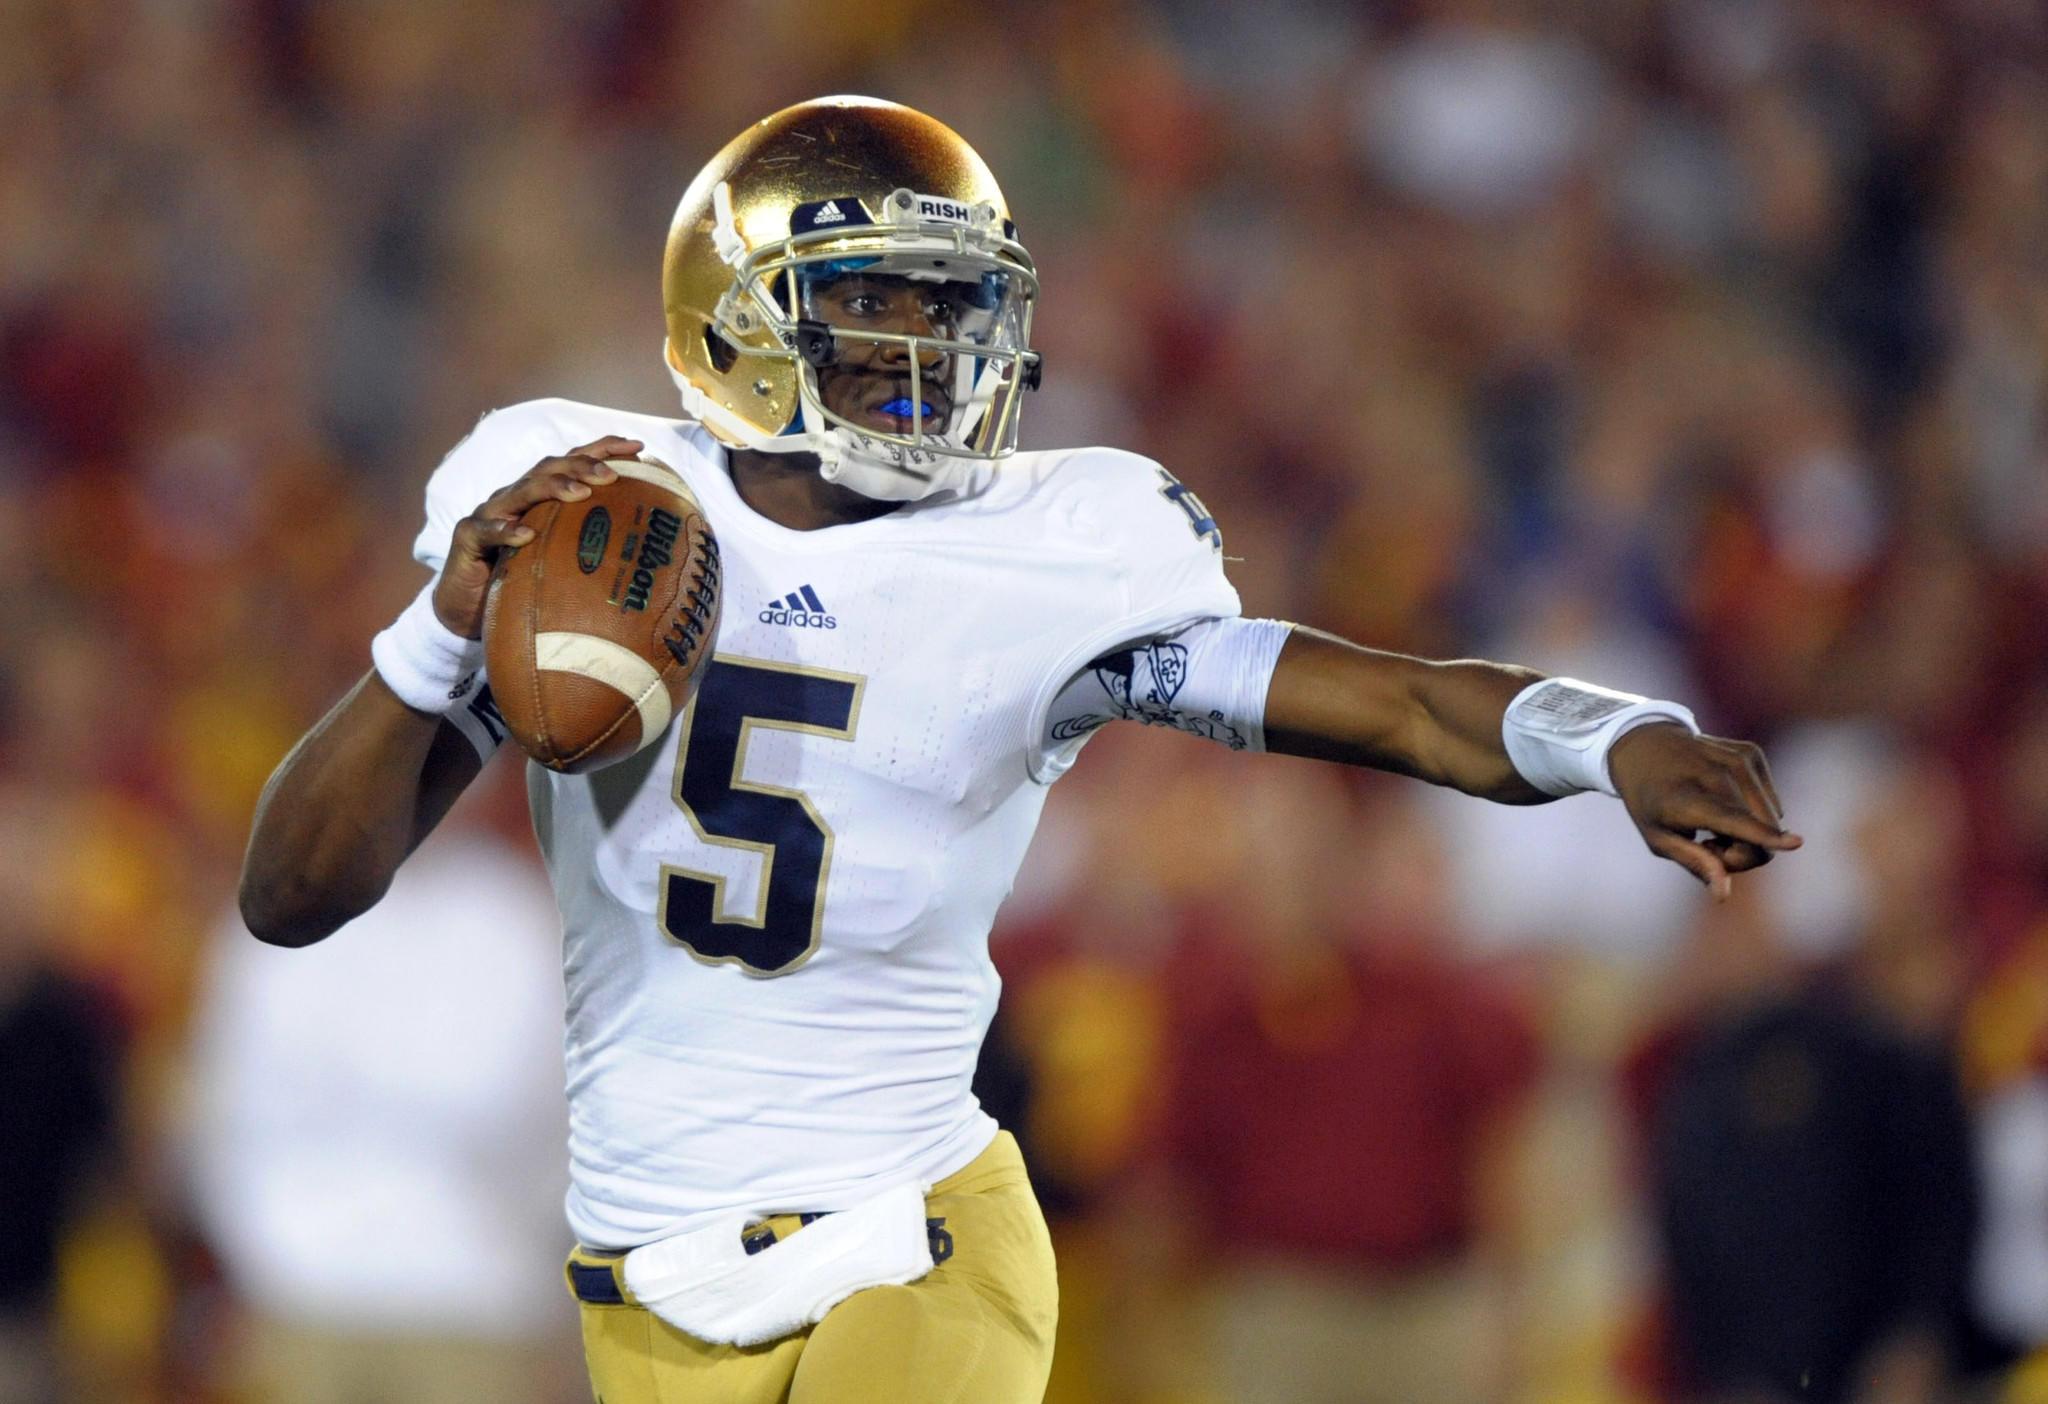 Notre Dame quarterback Everett Golson throws a pass against Southern California.